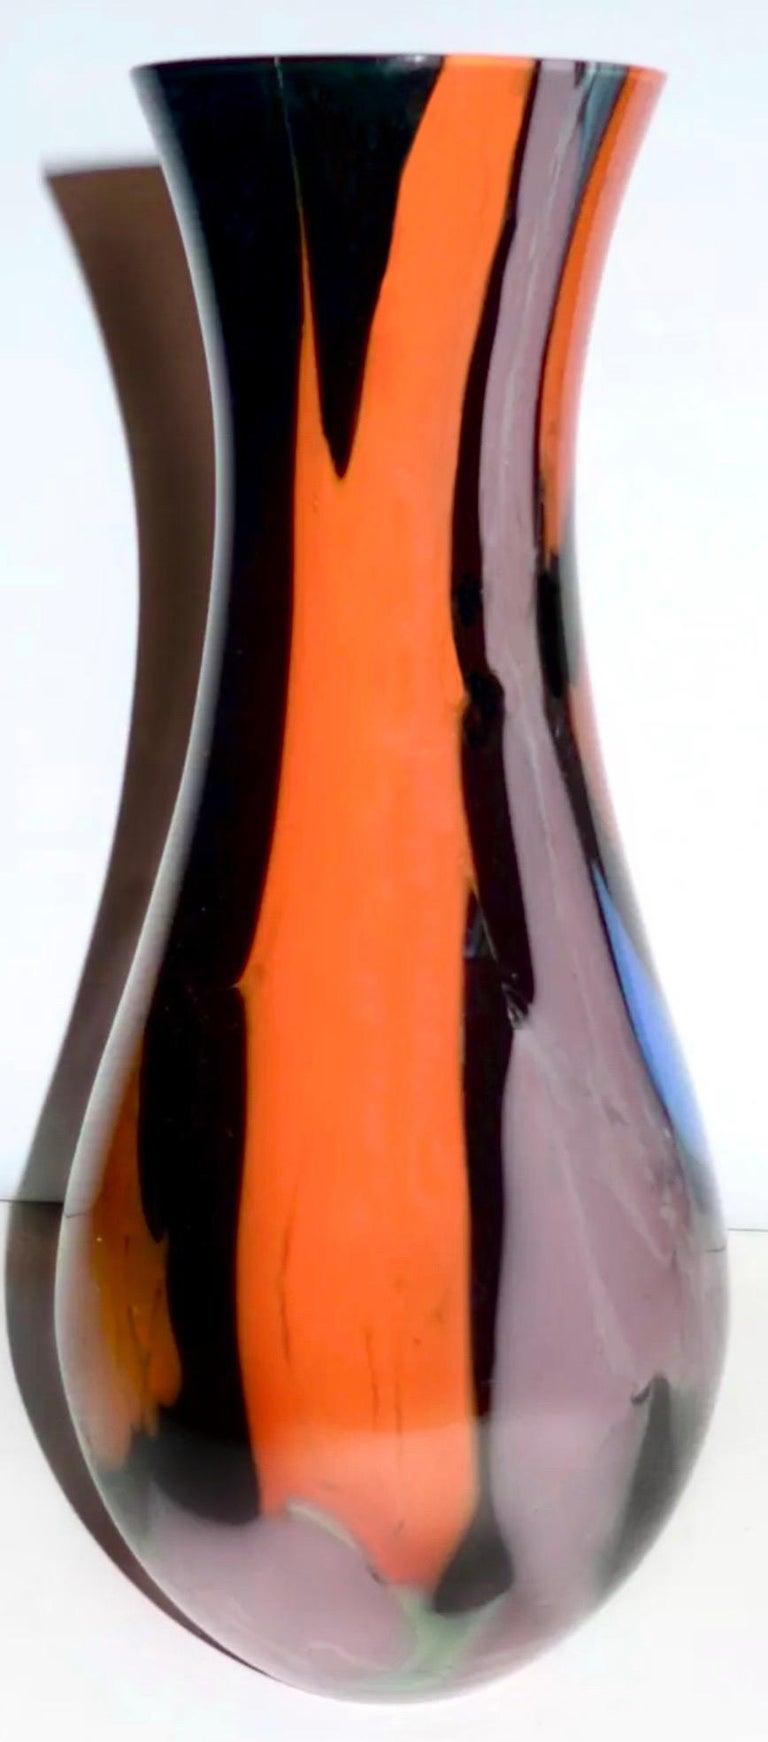 Vintage Murano Art Glass Signed Seguso Multicolored Vase, Italian Midcentury For Sale 1